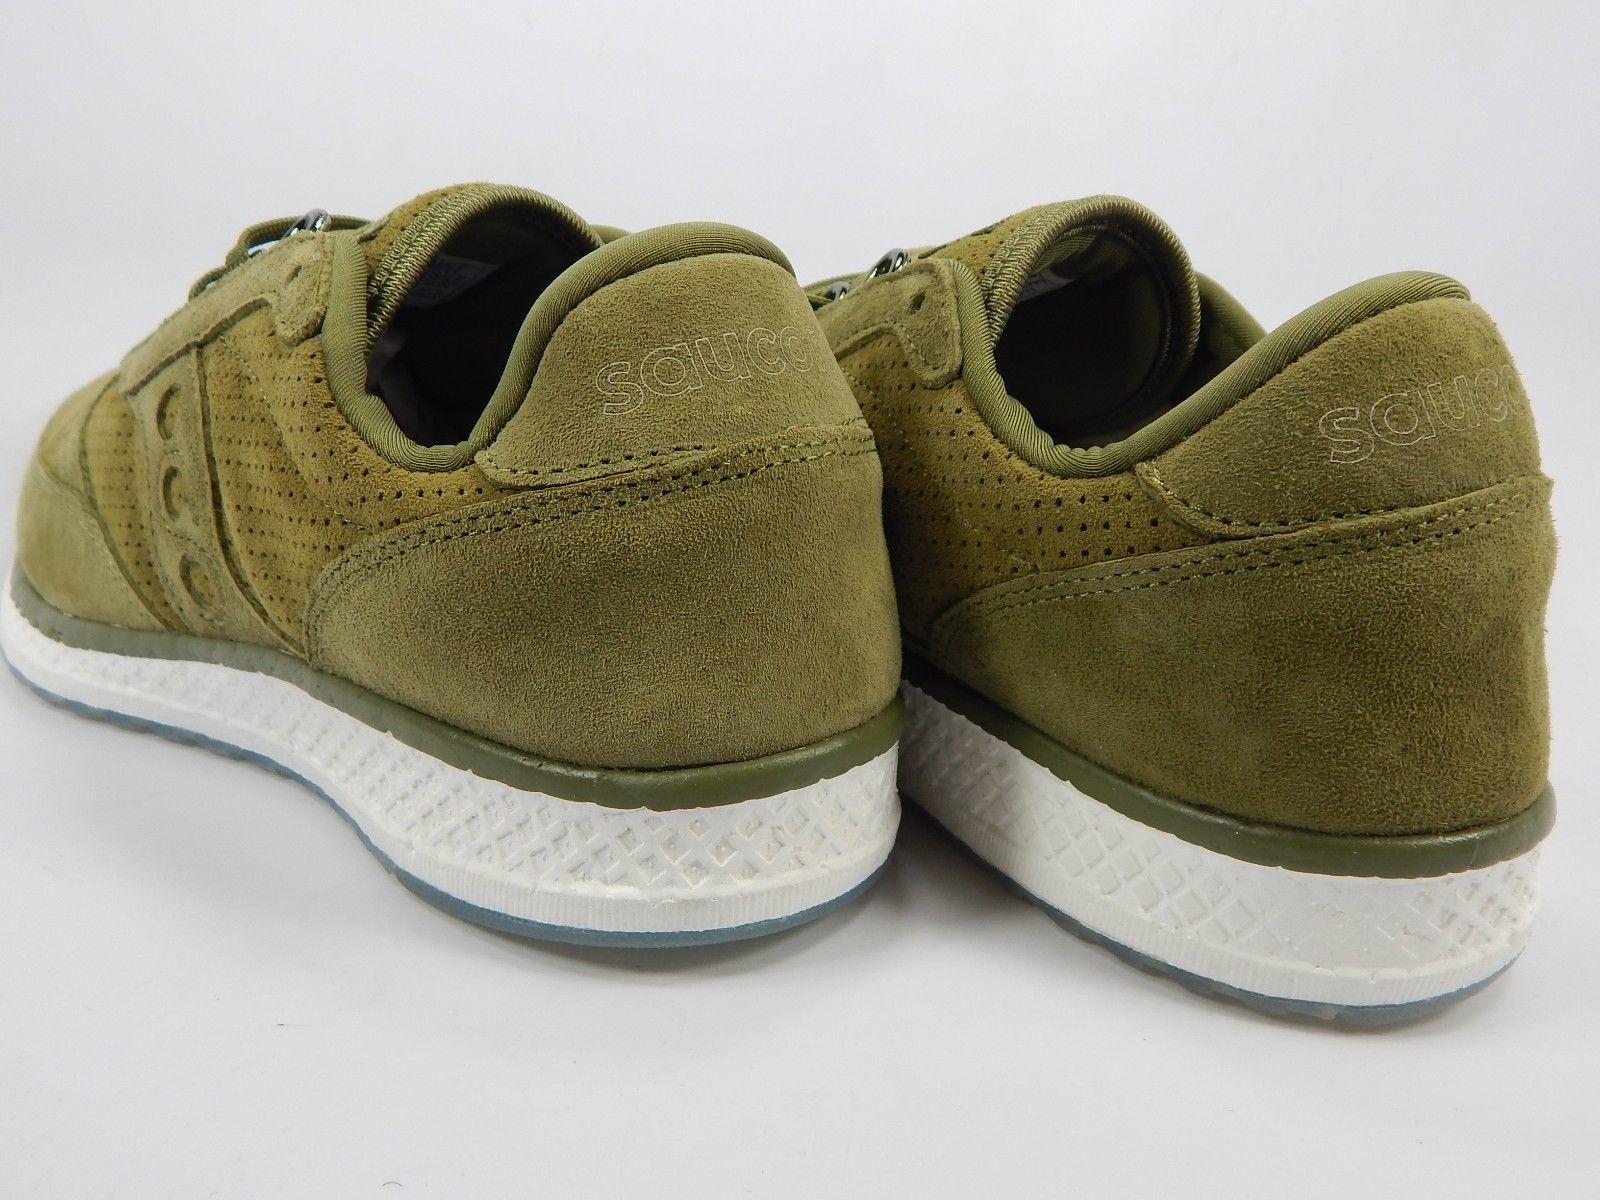 Saucony Freedom Runner Men's Running Shoes Sz US 9 M (D) EU 42.5 Green S40001-3